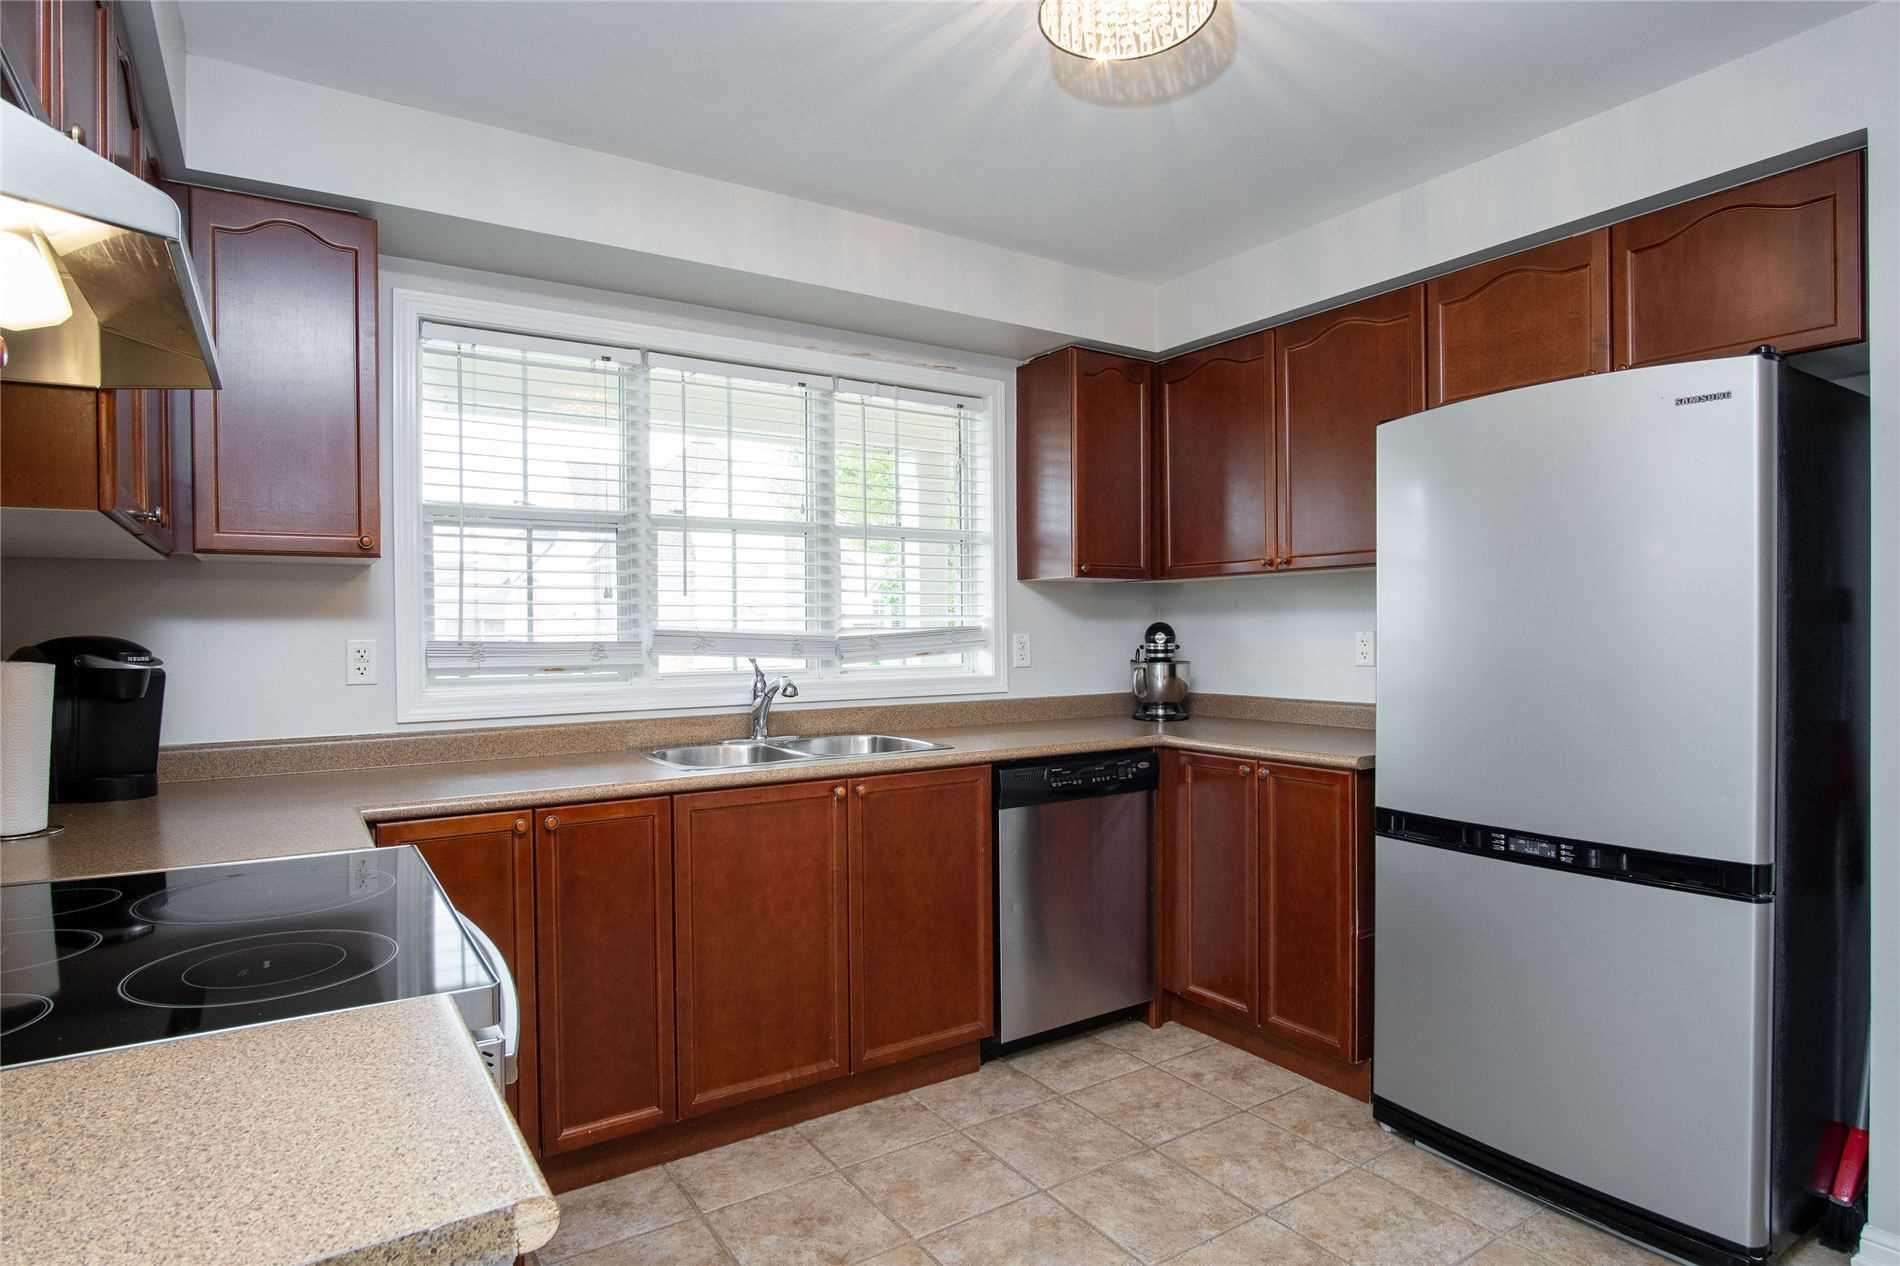 827 Biggar Hts - Coates Detached for sale, 4 Bedrooms (W5400280) - #11